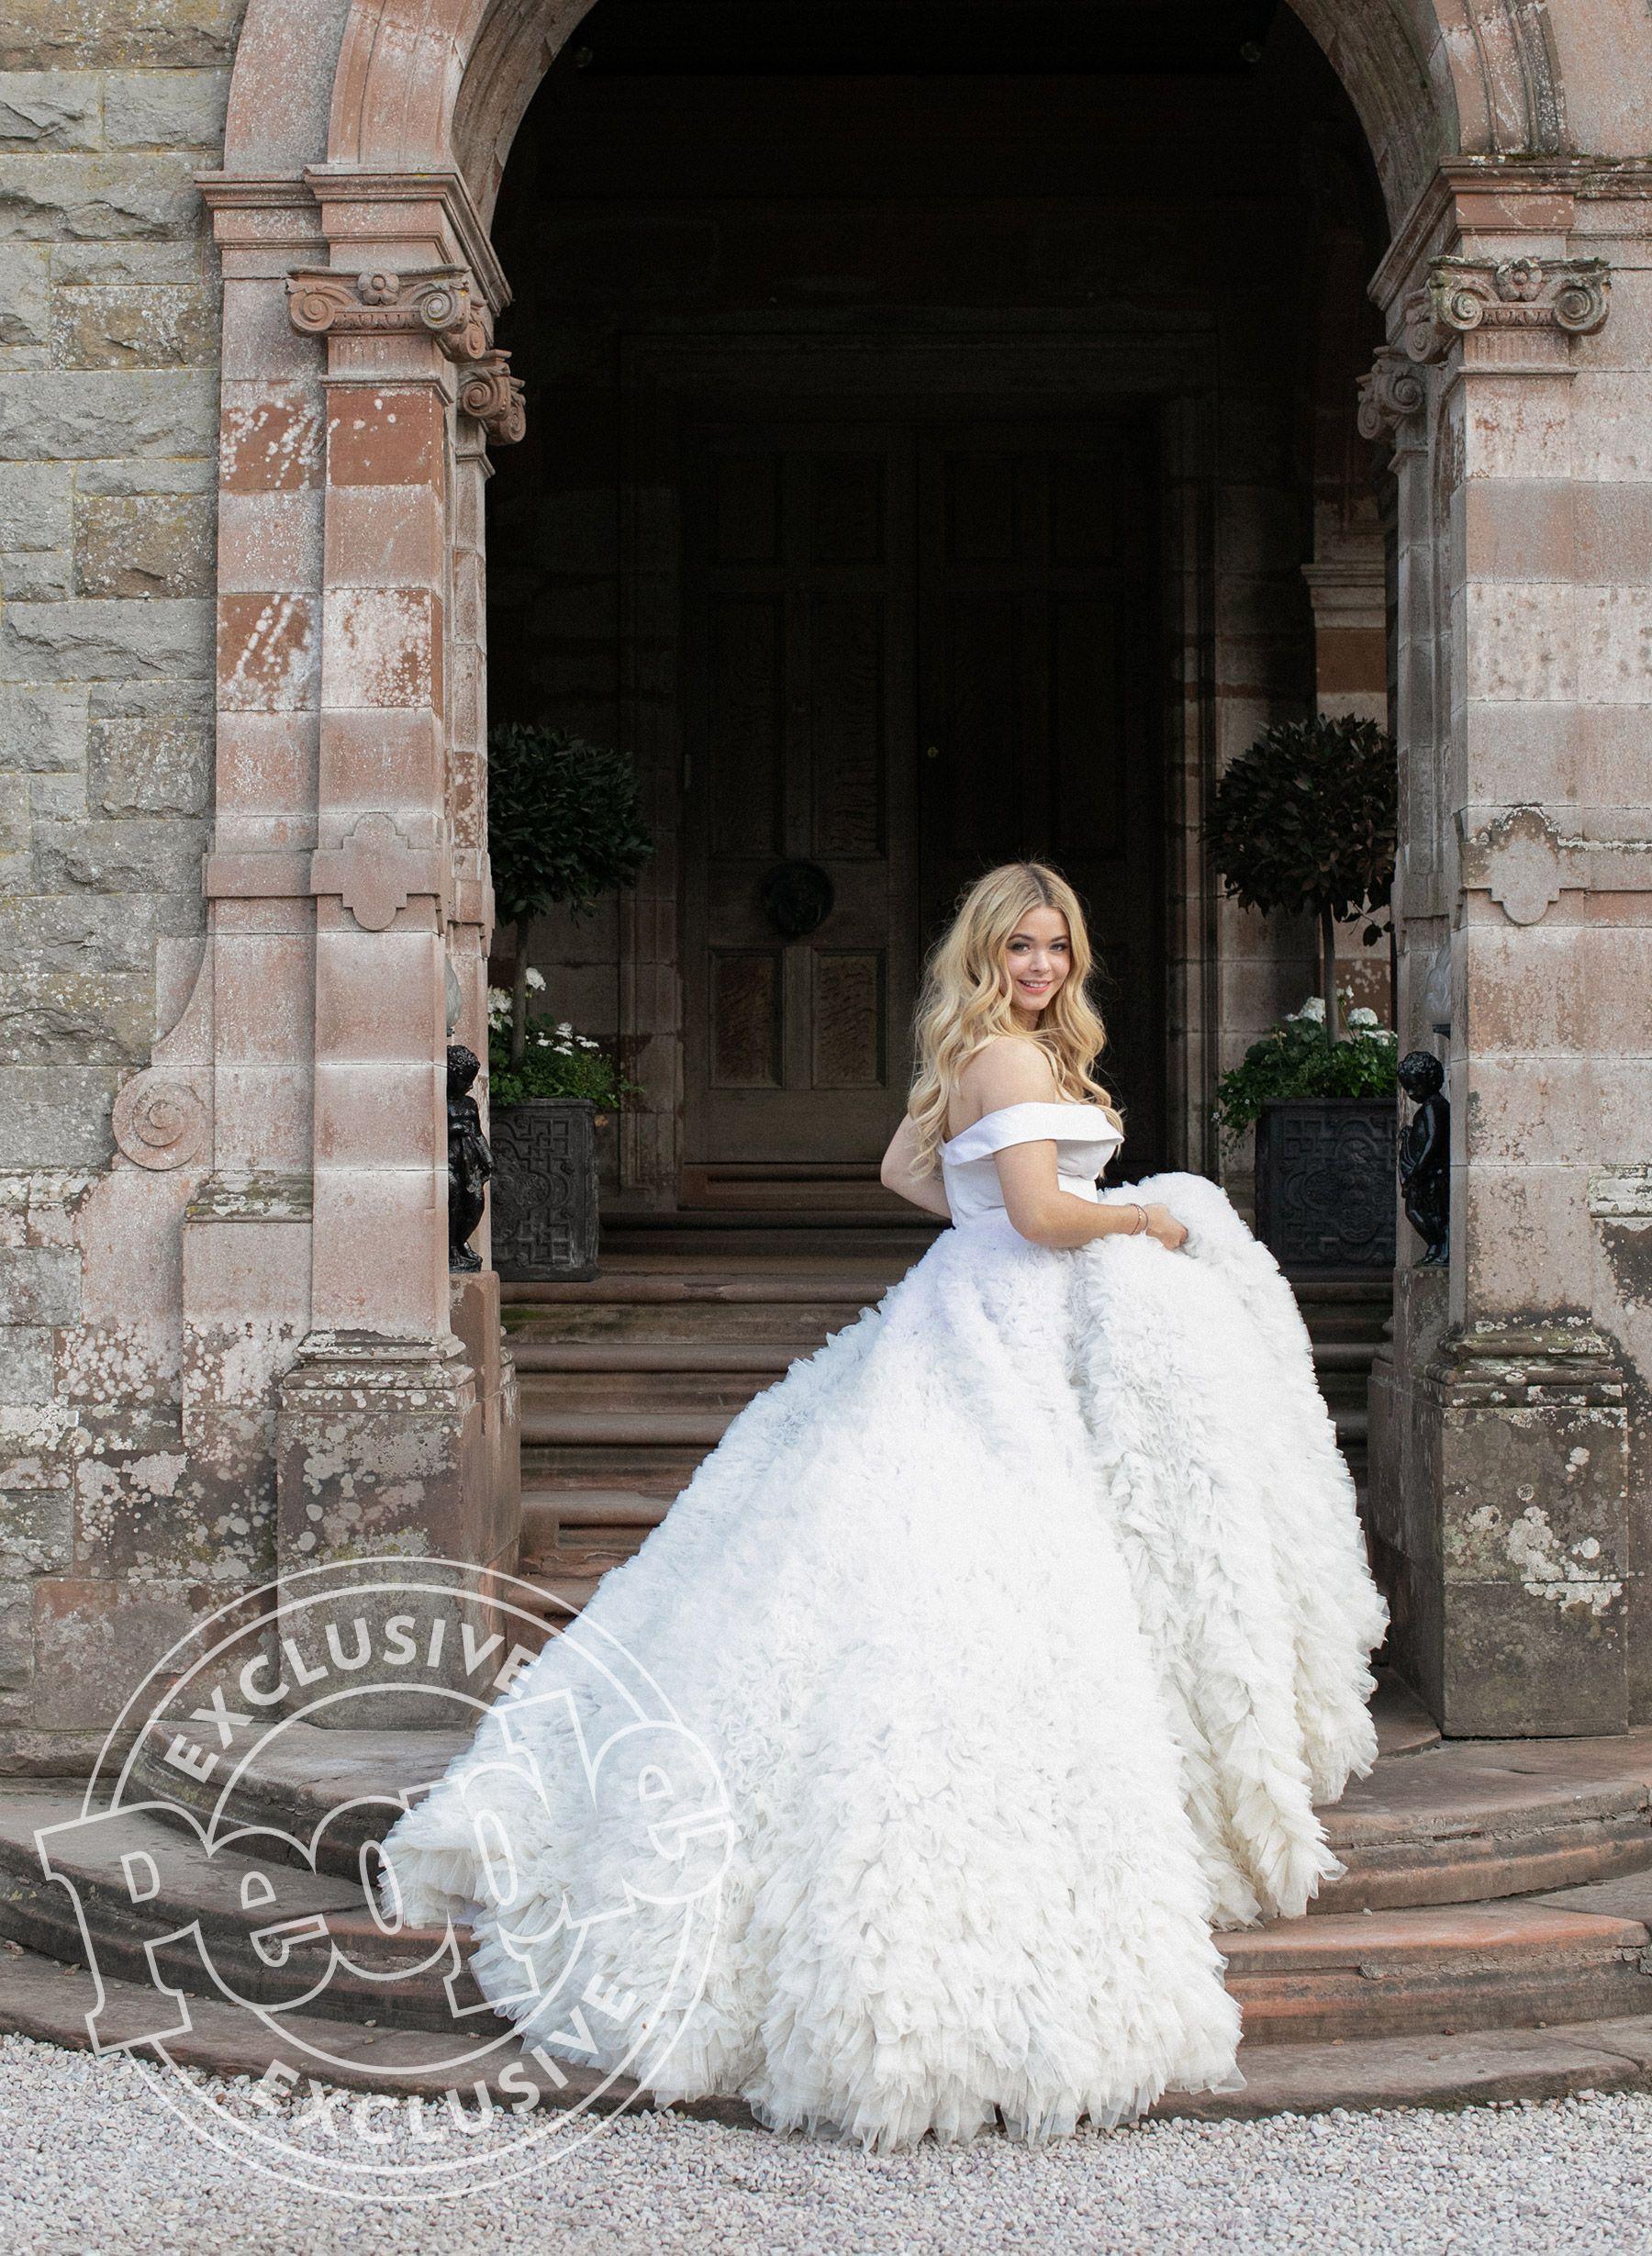 It S A Pretty Little Wedding See Pretty Little Liars Star Sasha